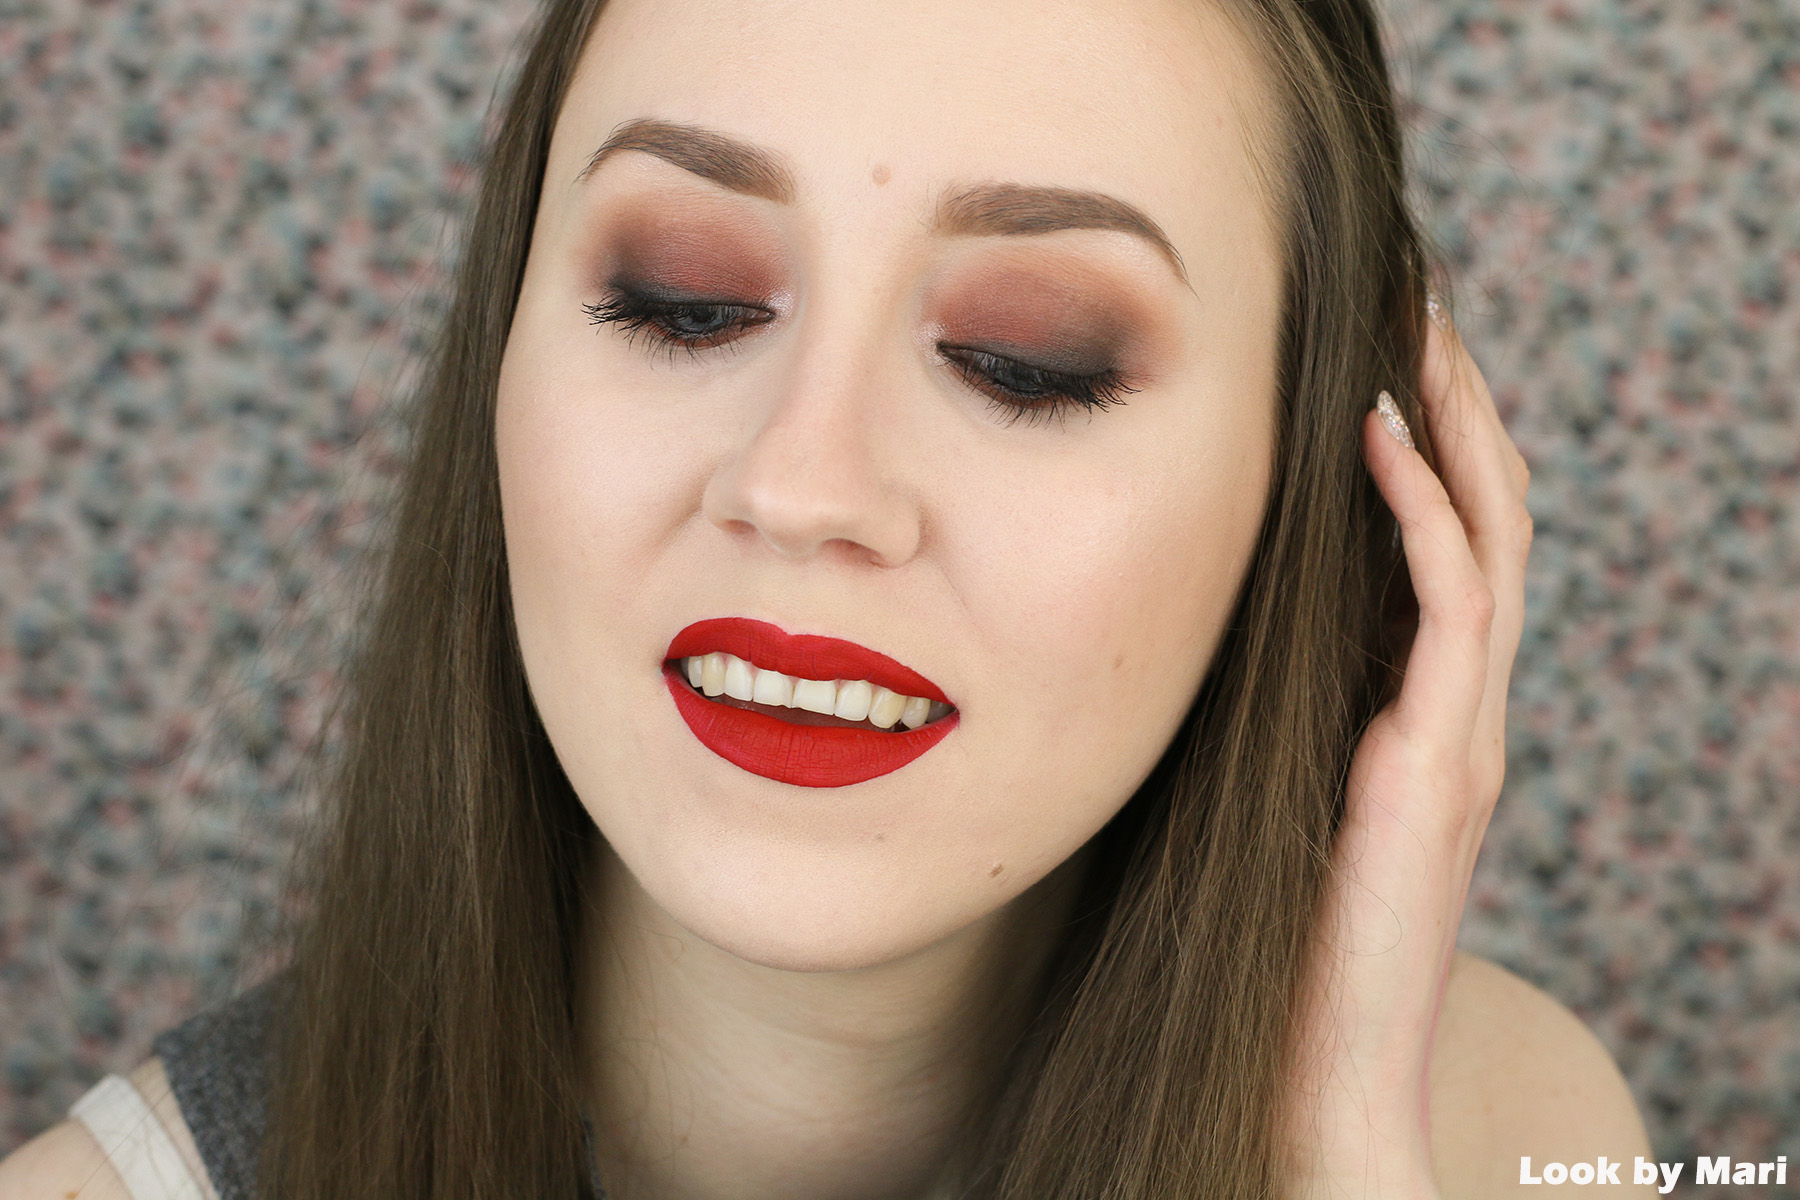 3 anastasia beverly hills modern renessaince eyeshadow palette ideas review-2